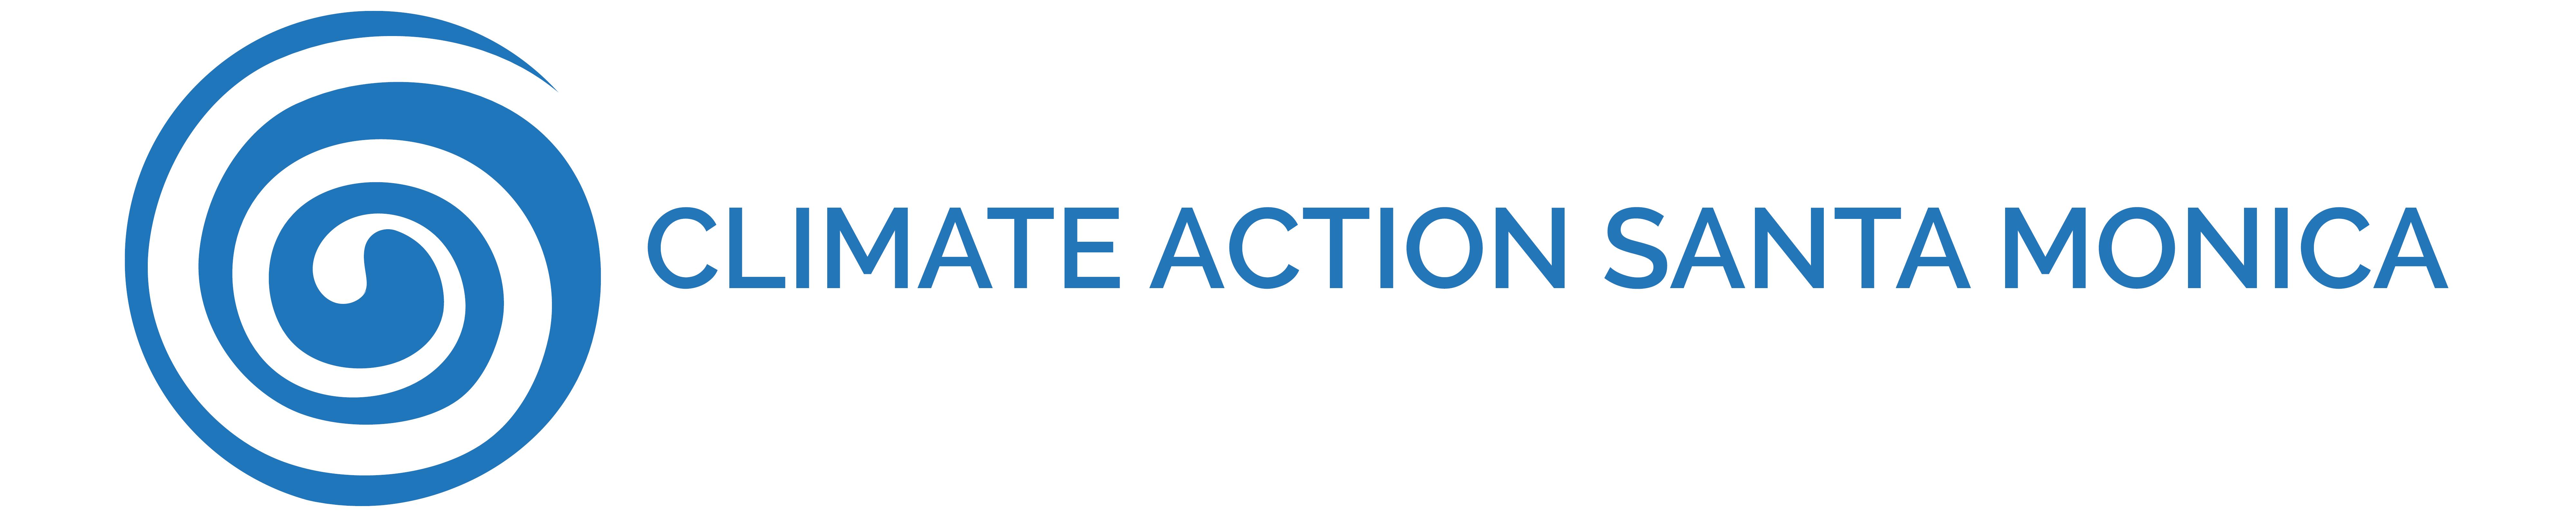 Climate Action Santa Monica